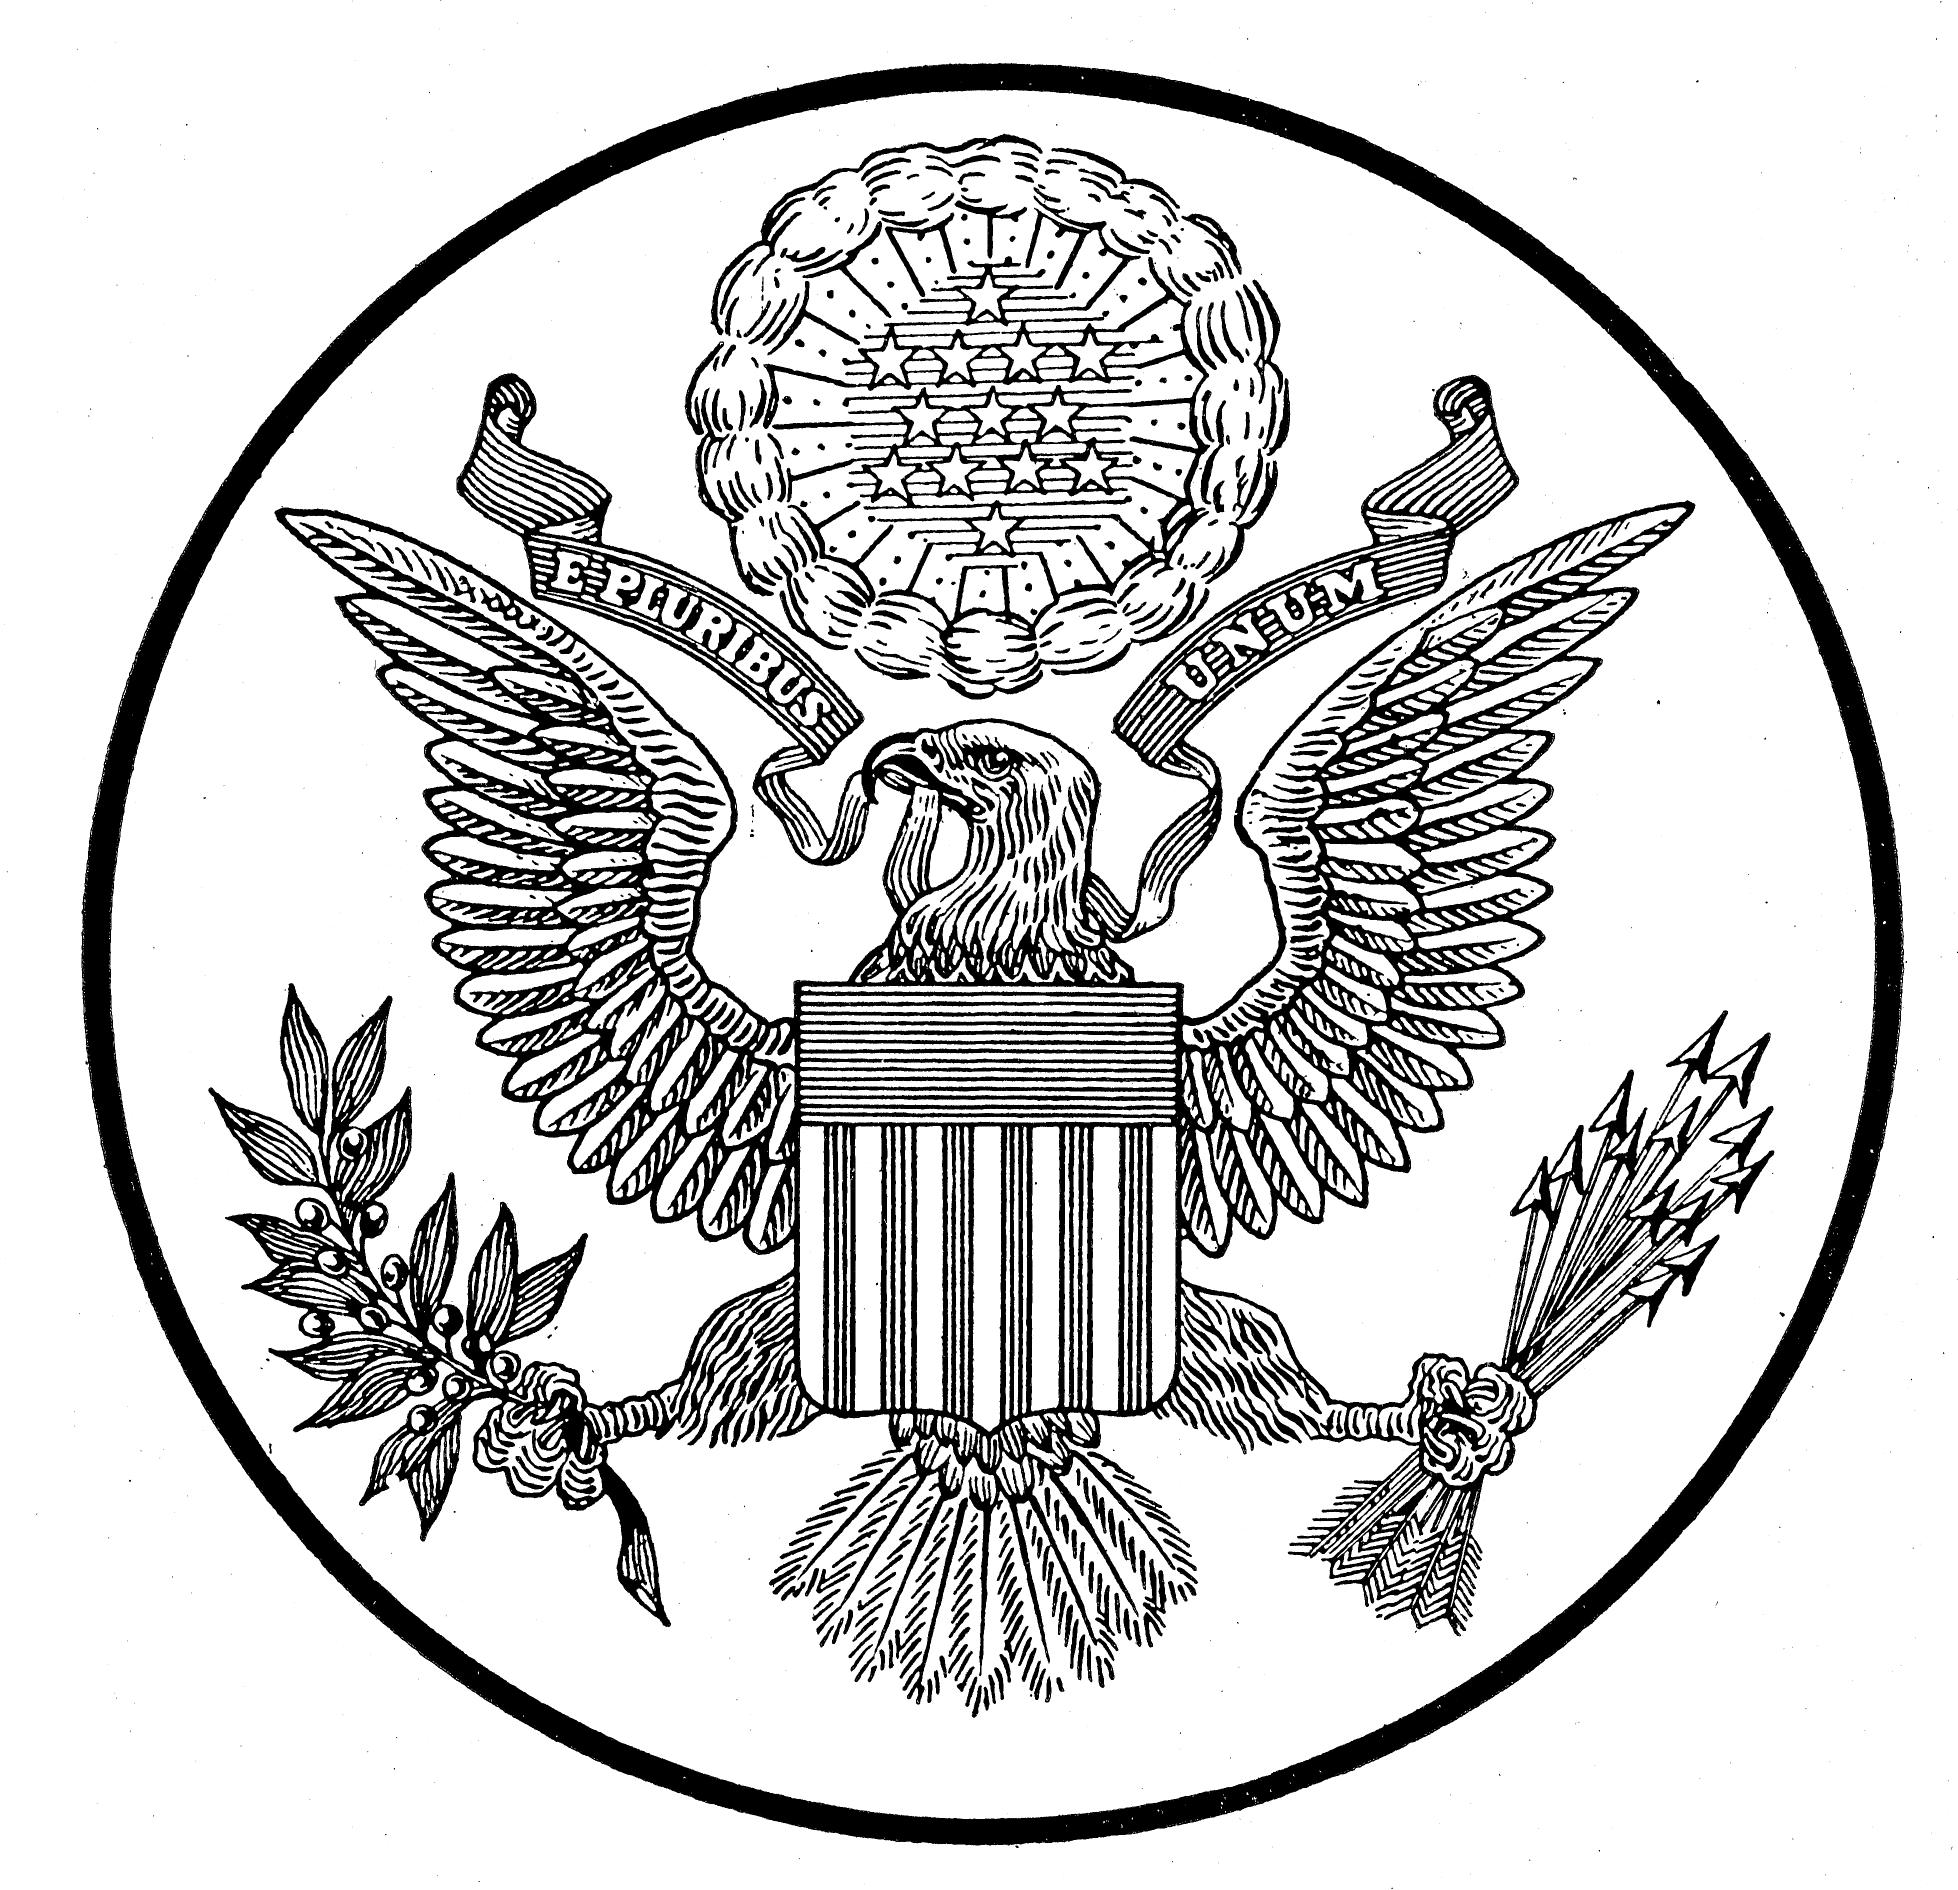 United Sates Seal Printable | Patriotic symbols, American ...